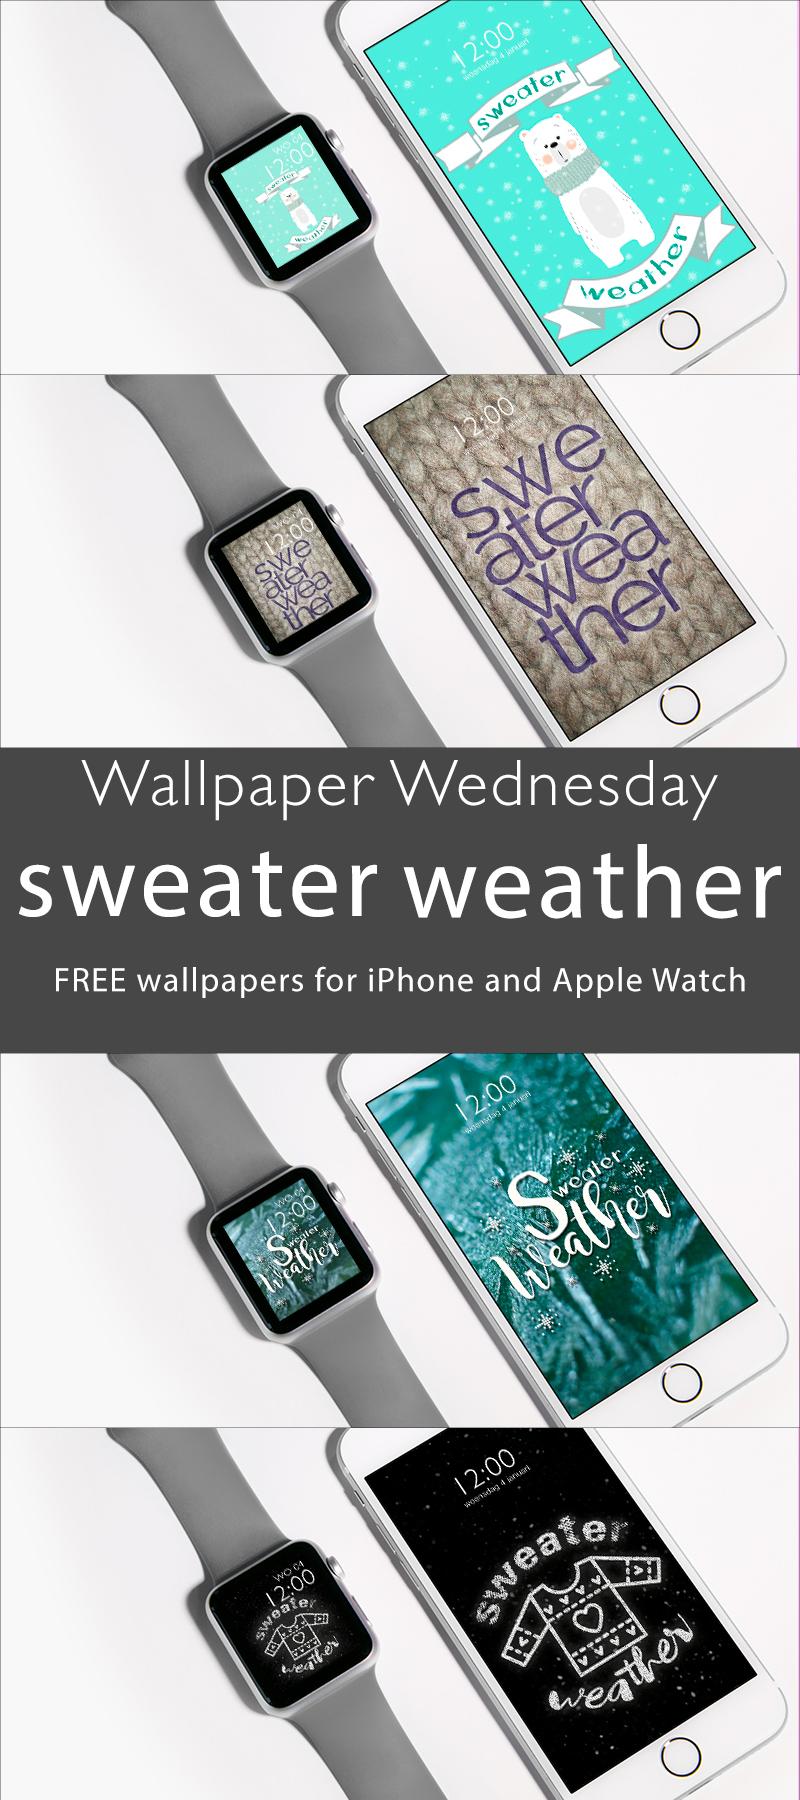 Wallpaper Wednesday: sweater weather free iPhone smartphone Apple Watch watch face wallpaper - ©debbieschrijft.nl